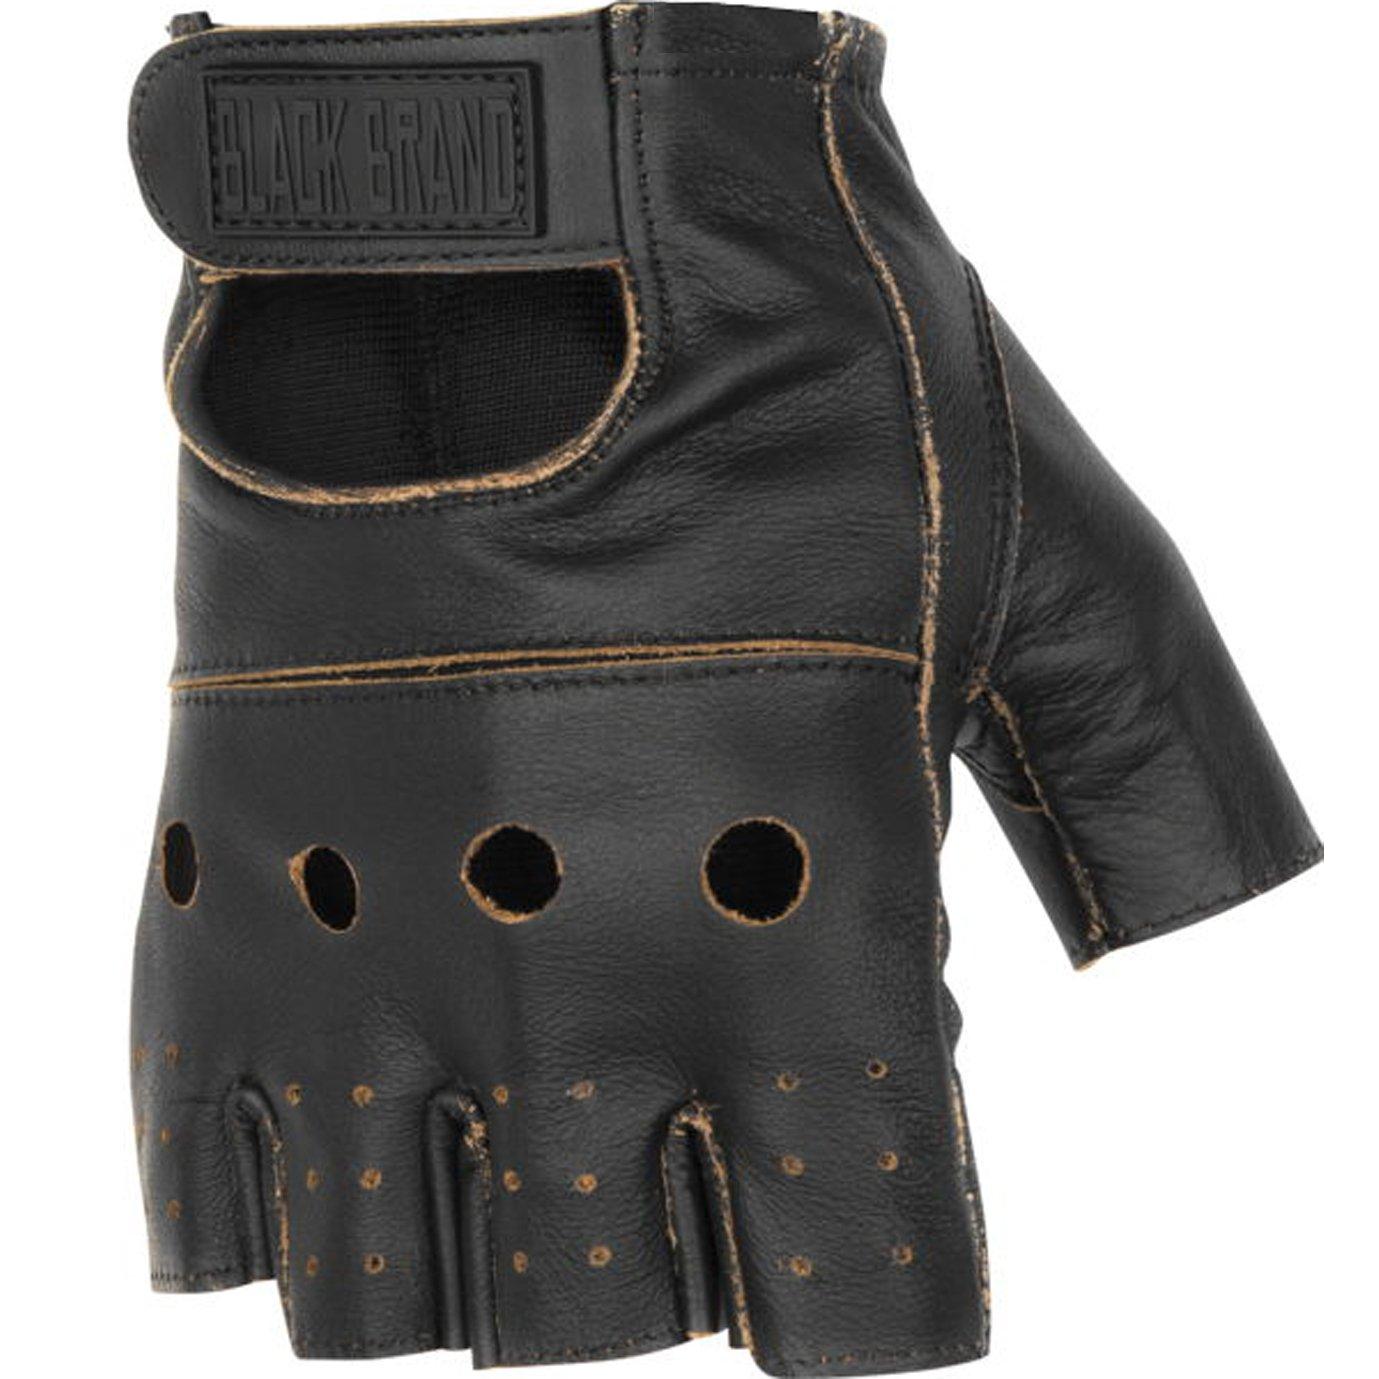 Black Brand Men's Leather Vintage Knuckle Shorty Motorcycle Gloves (Brown, Medium)